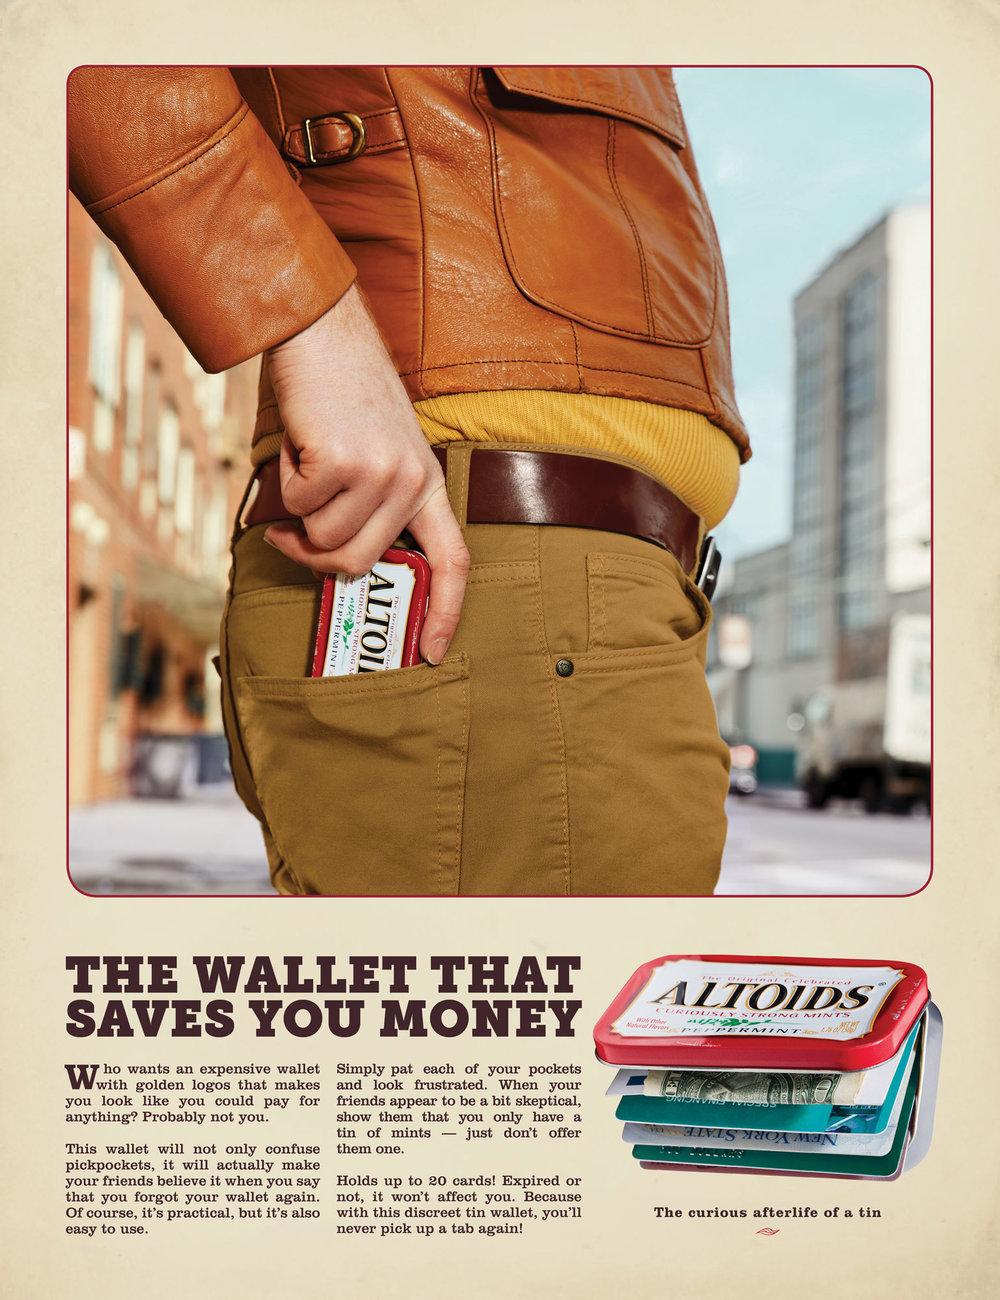 Altoids - The Wallet